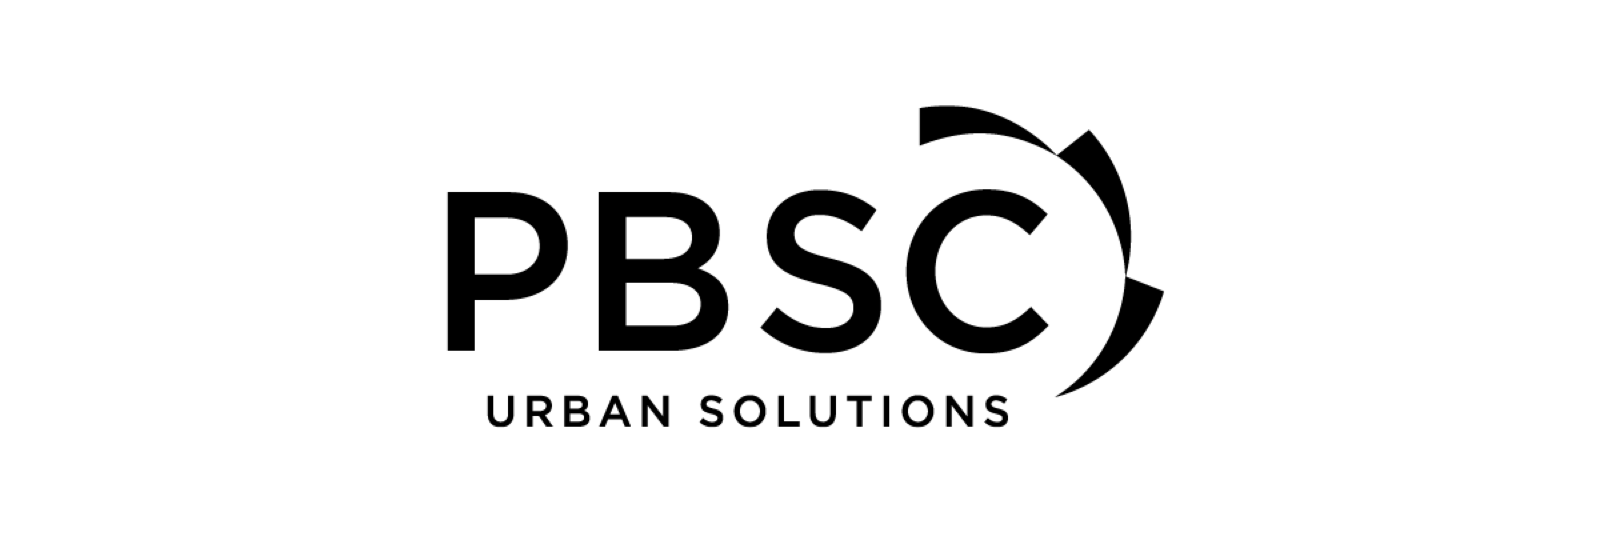 PBSC-1600x533.png